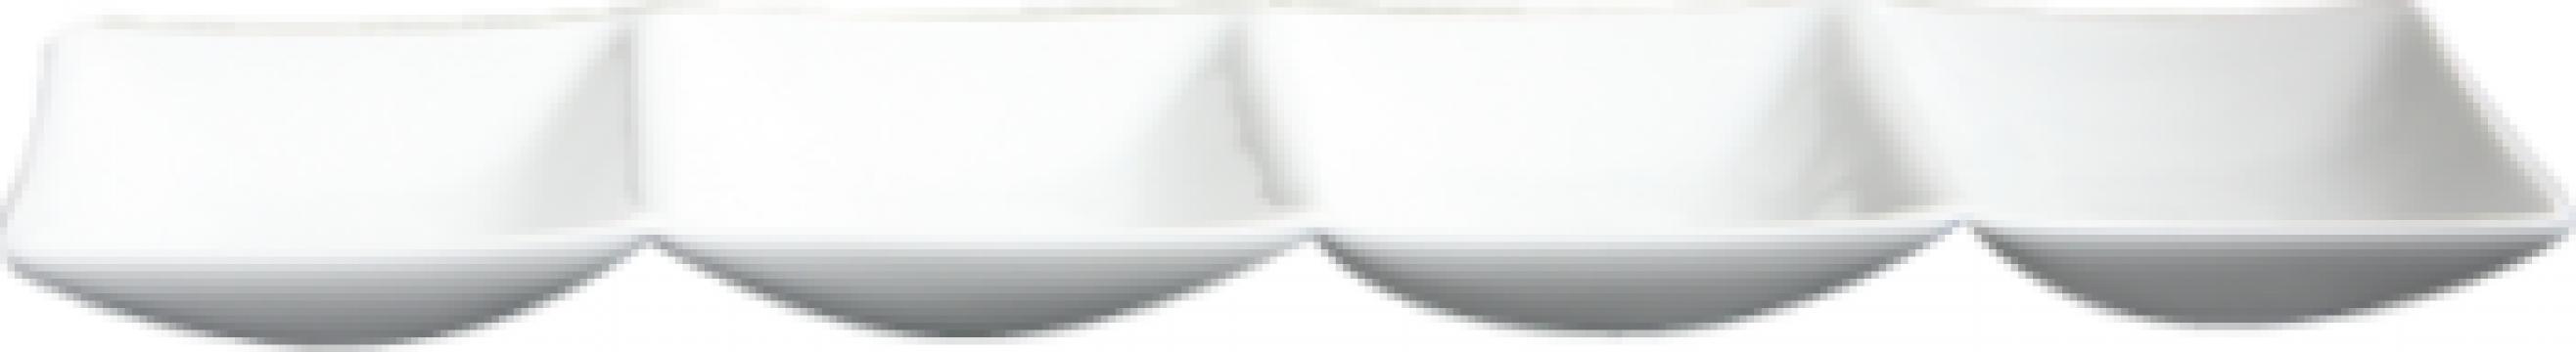 Platou 4 compartimente portelan 33x8cm colectia Hong Kong de la Basarom Com